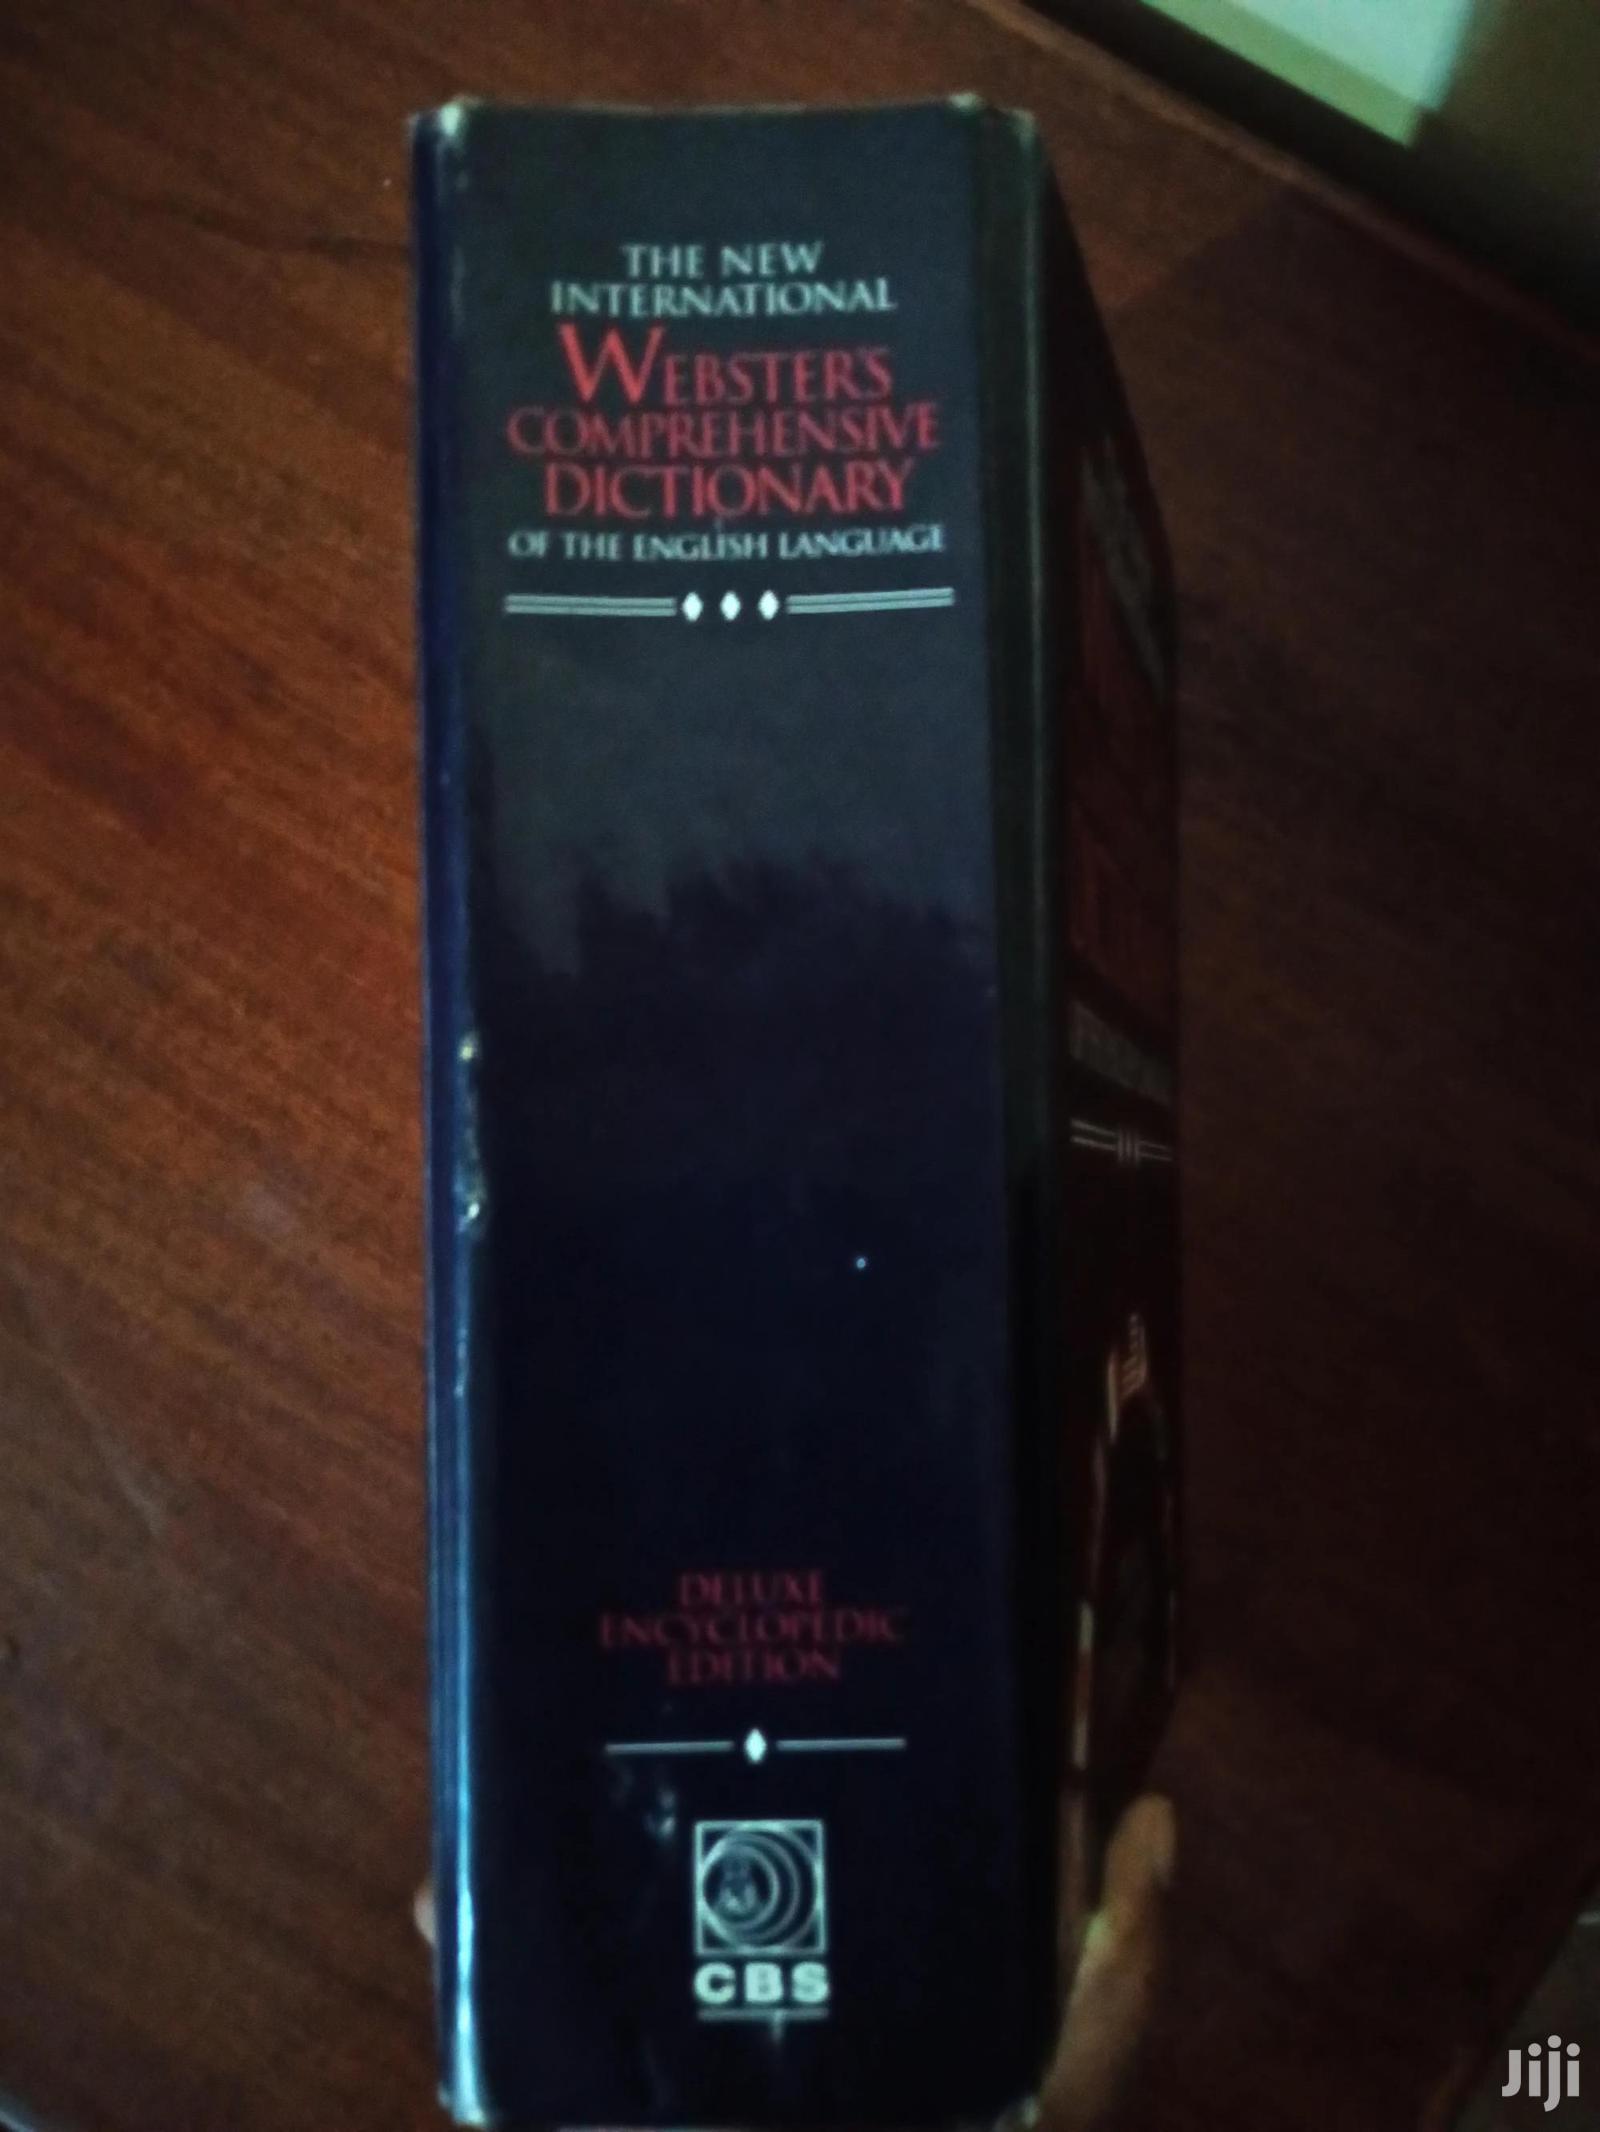 Dictionary*Webster's Comprehensive Dictionary* | Books & Games for sale in Kilimani, Nairobi, Kenya